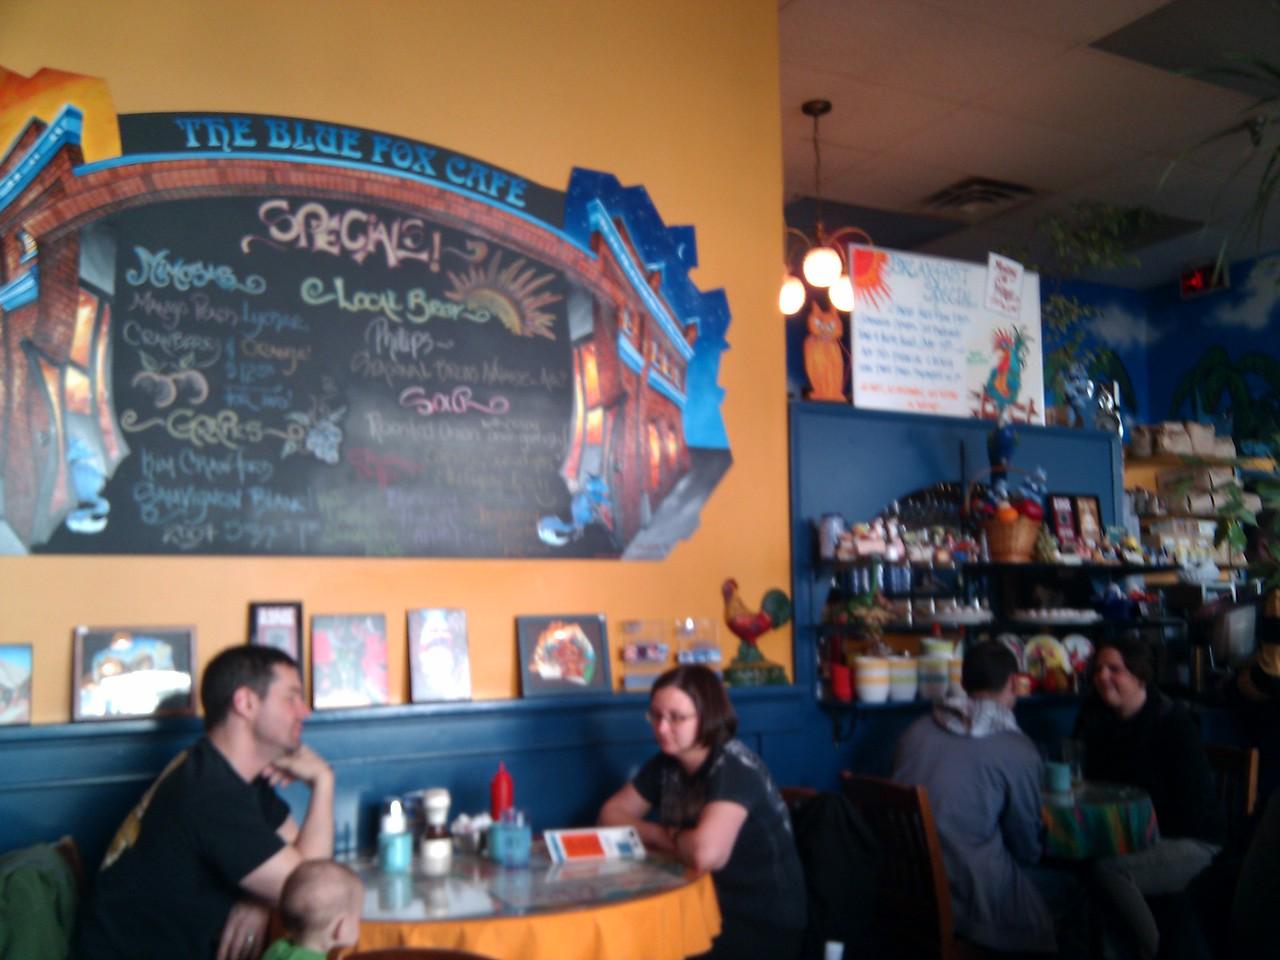 Blue Fox Cafe